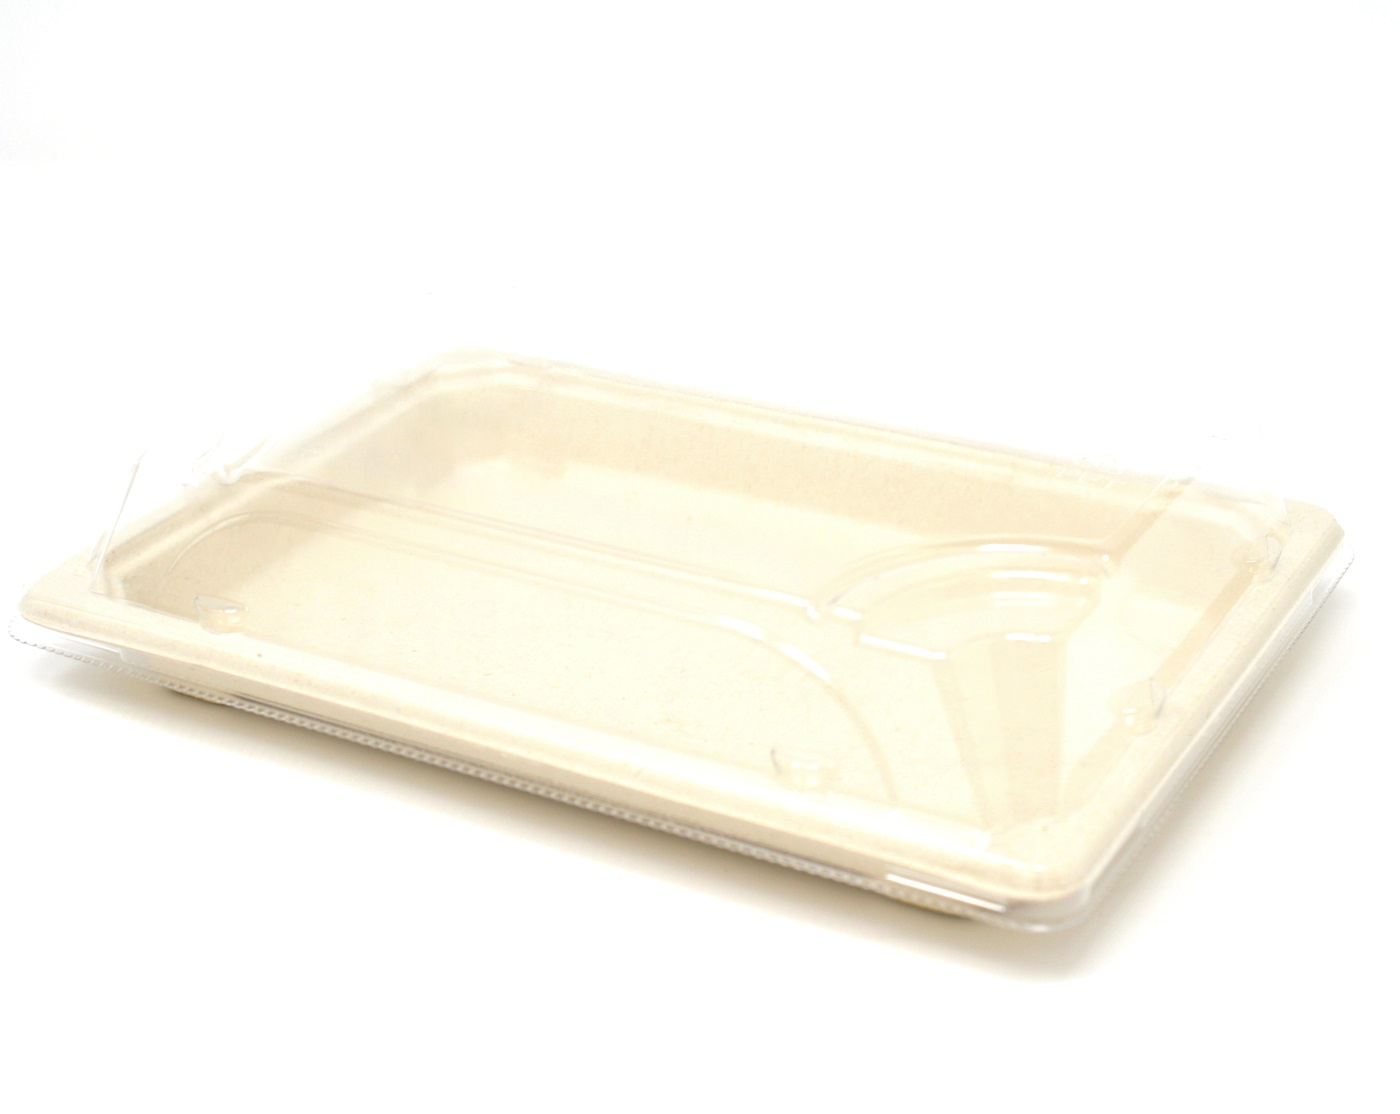 "Sushi Tray 7.26""x5.04""x0.80"" Jocla Panama"